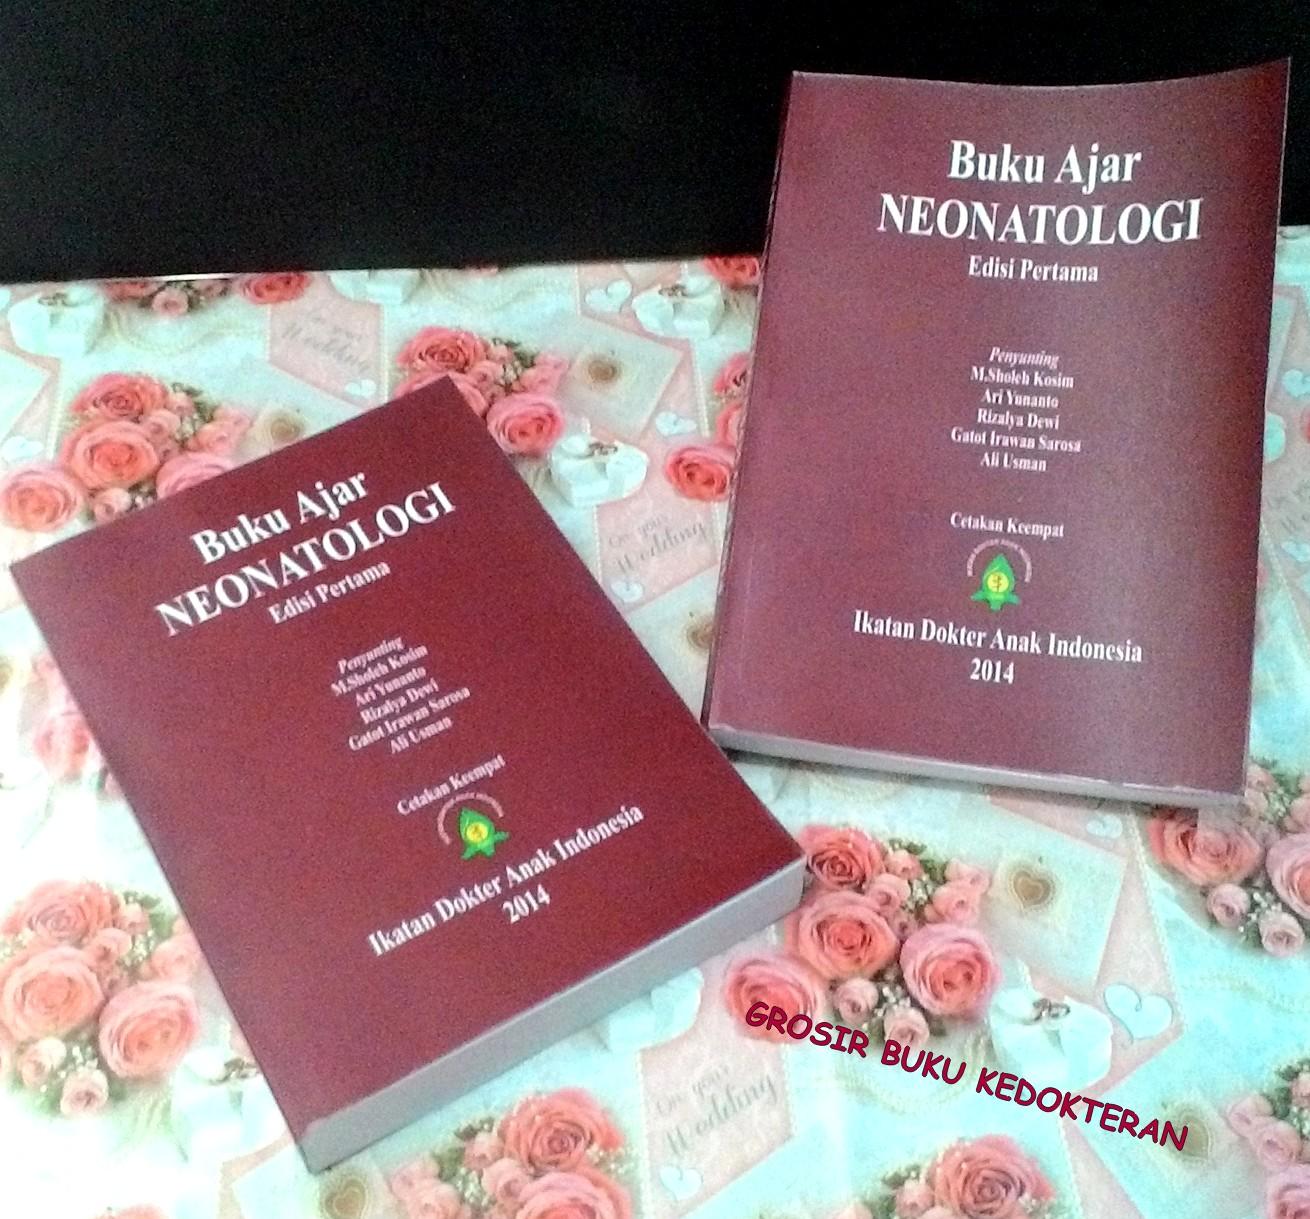 Buku Ajar Neonatologi eds 1